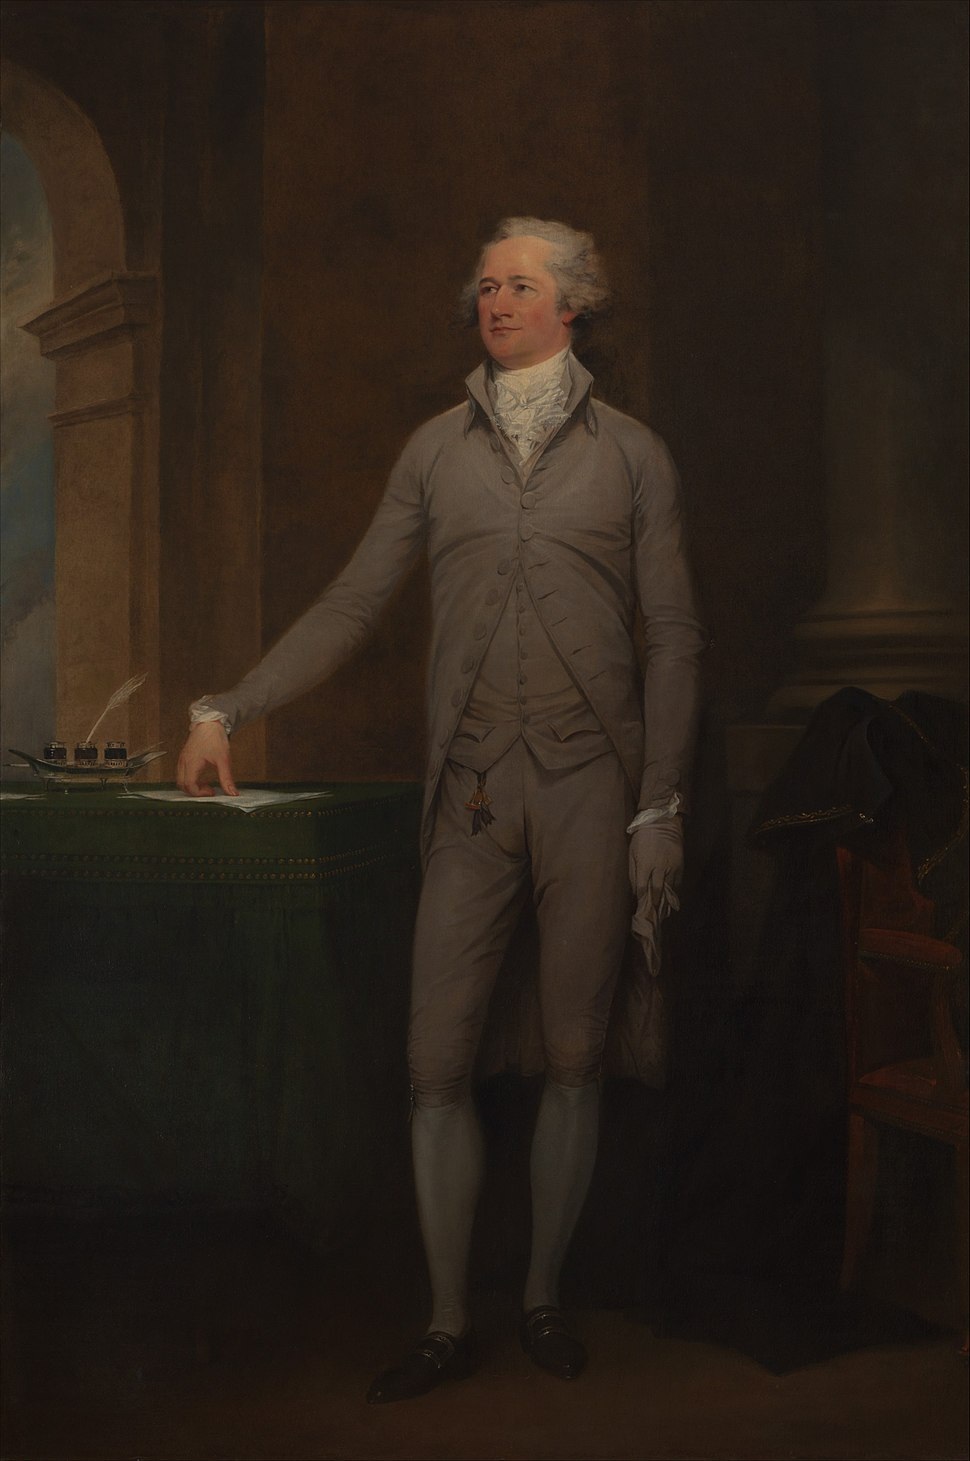 Hamilton Trumbull 1792